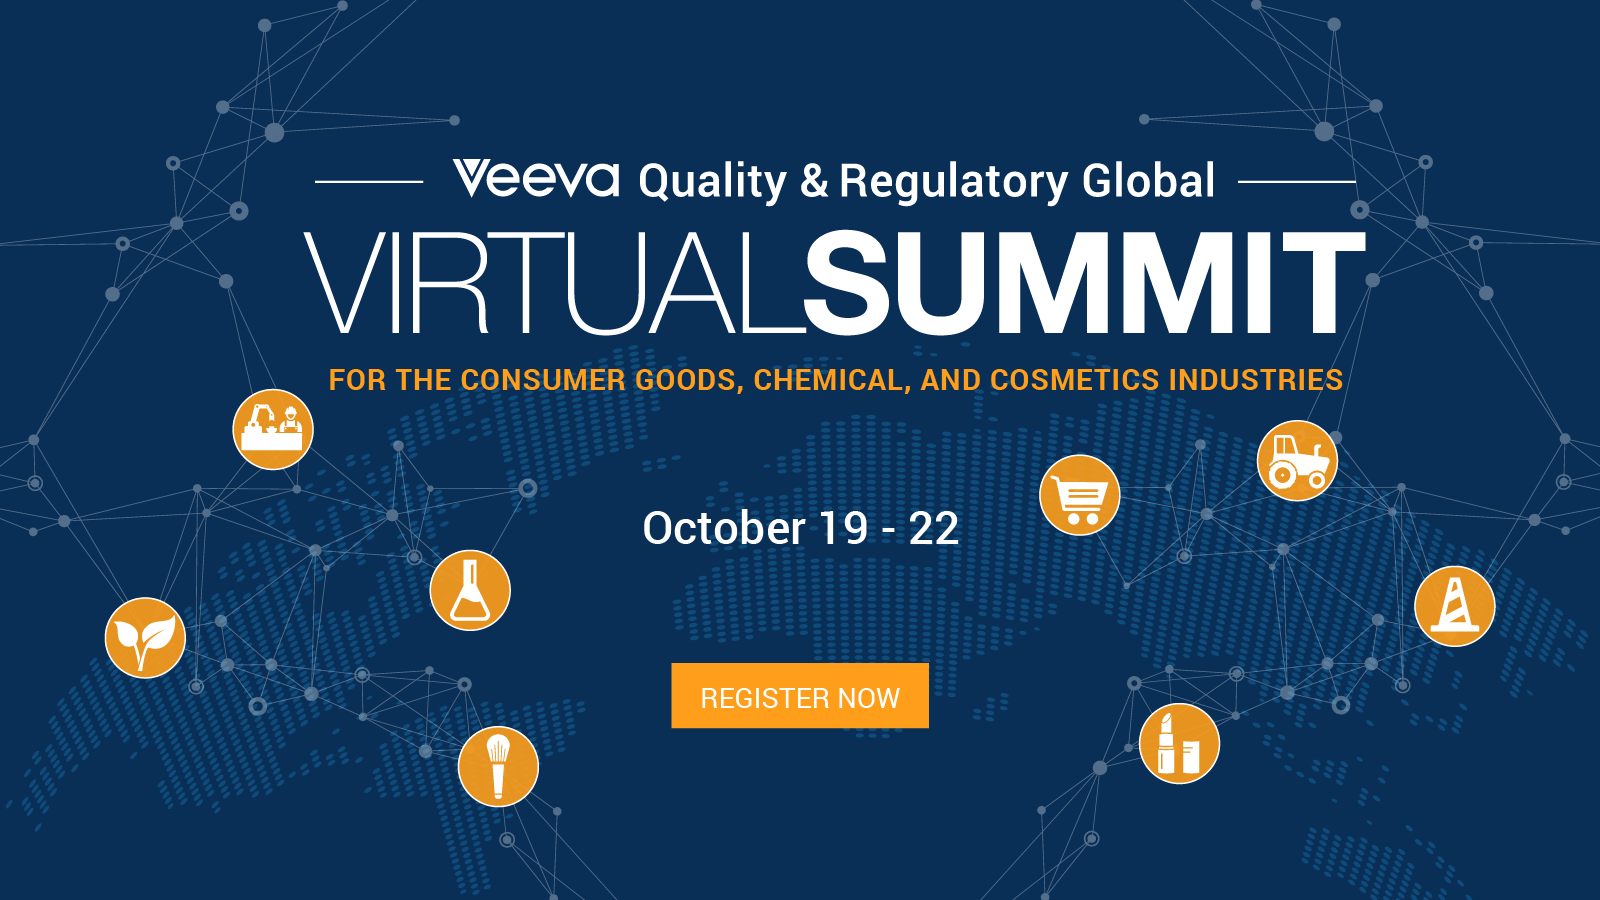 BASF, Colgate-Palmolive, Estée Lauder, and Unilever Among Keynote Speakers at 2020 Veeva Quality & Regulatory Global Summit